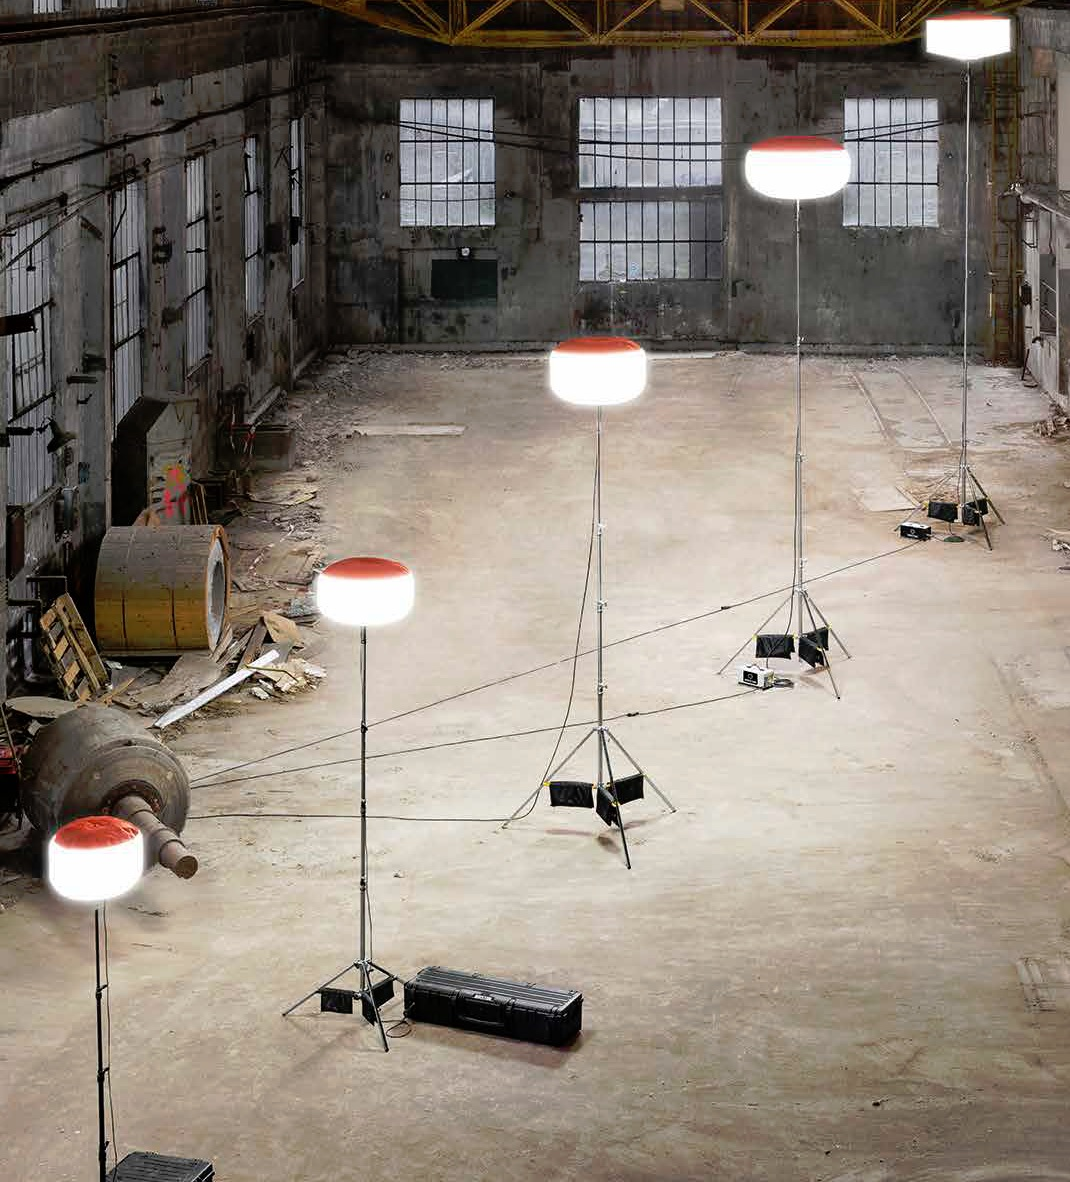 Airstar Sirocco fényballonok biztonságtechnikai célra